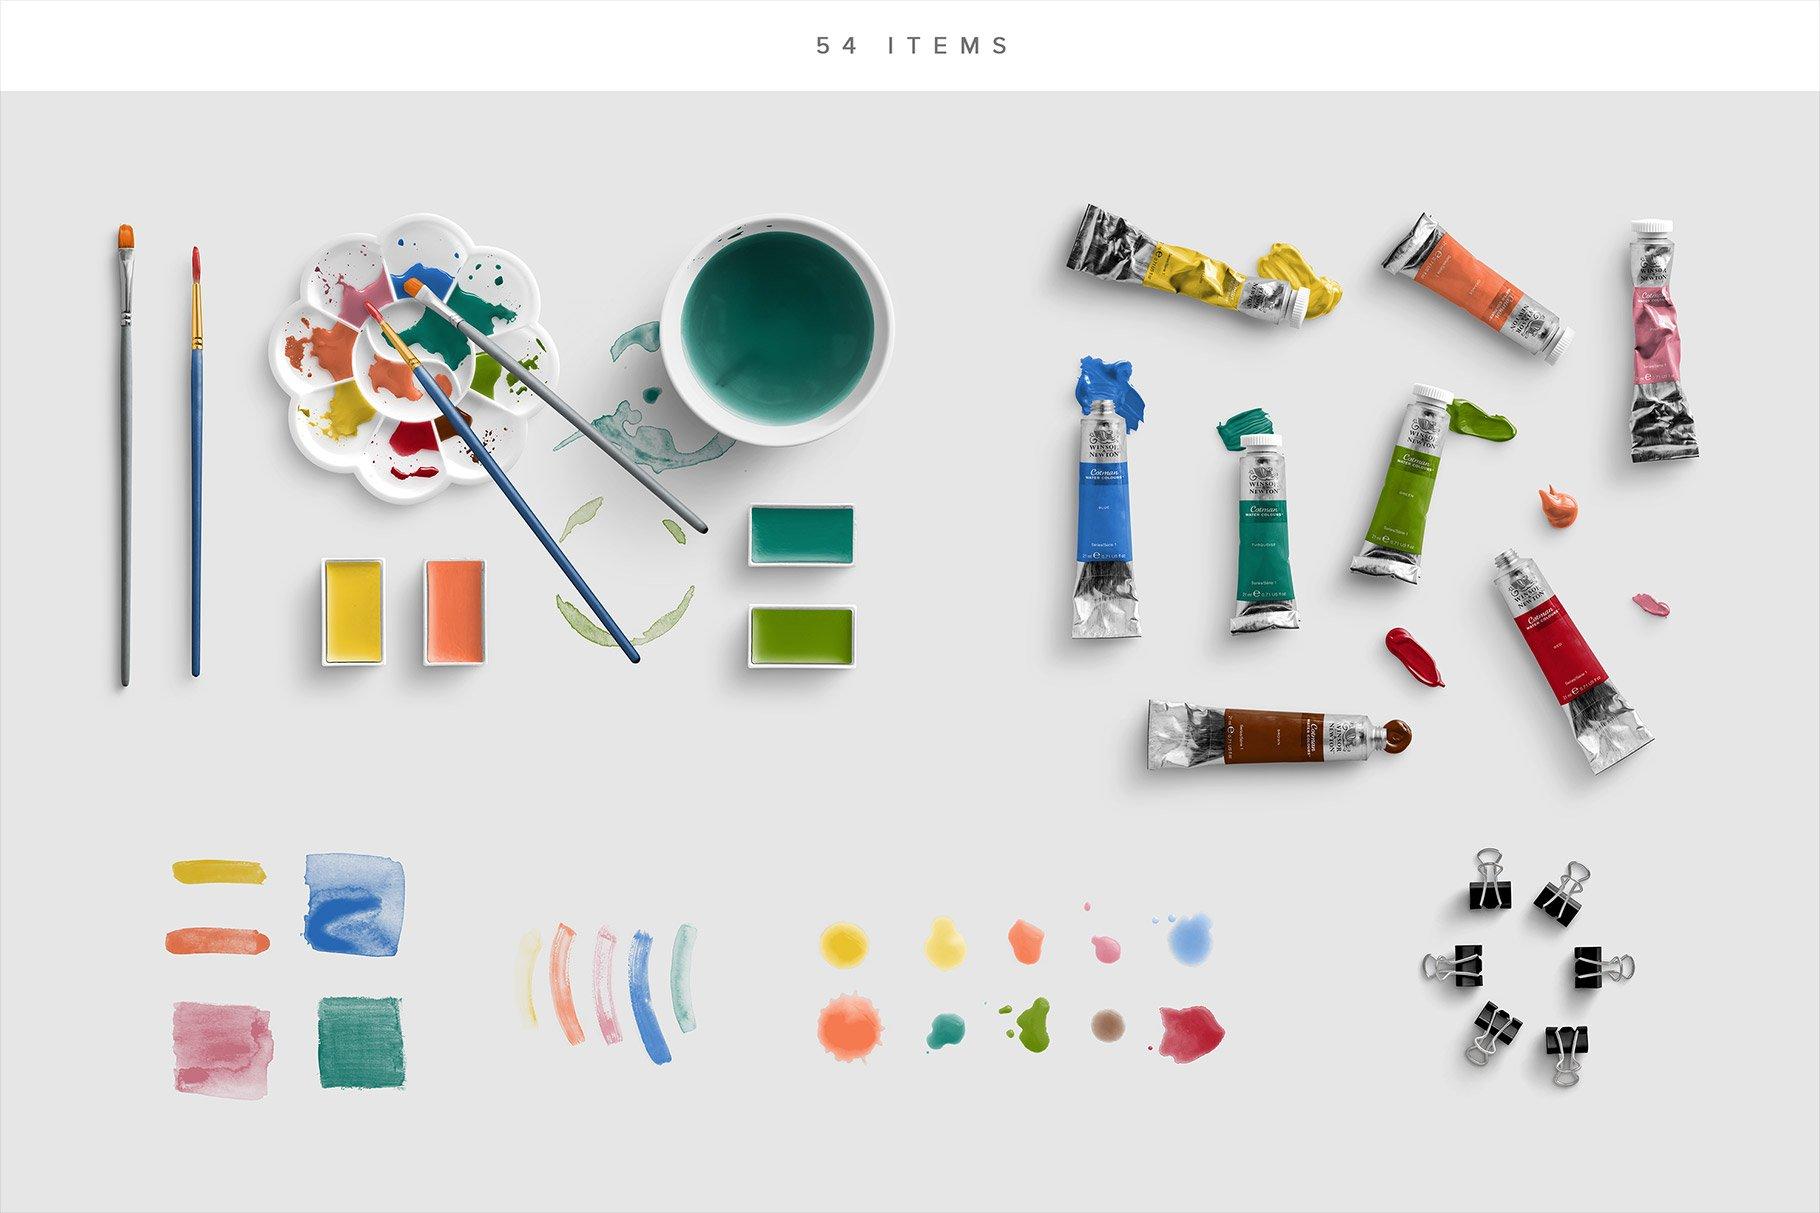 watercolor mockup scene creator photoshop 3 list of items